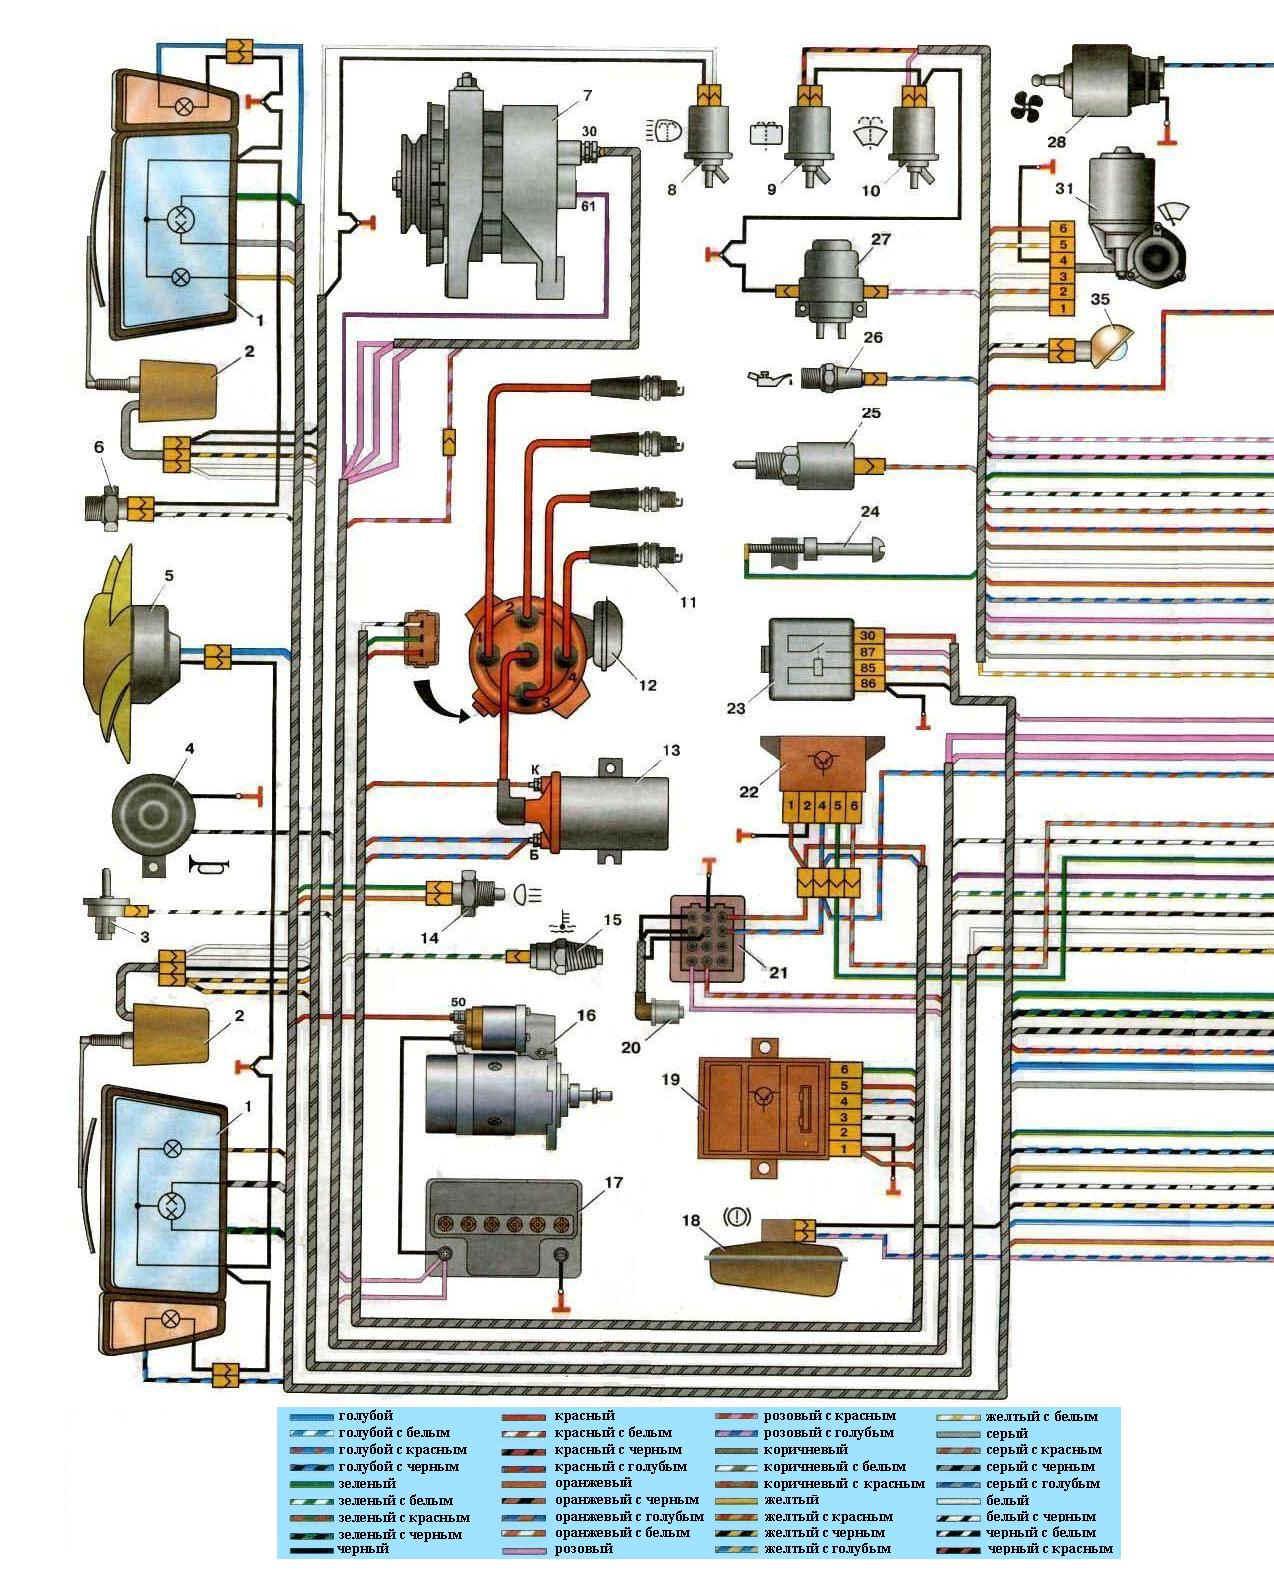 Схема электрооборудования ВАЗ-2104.